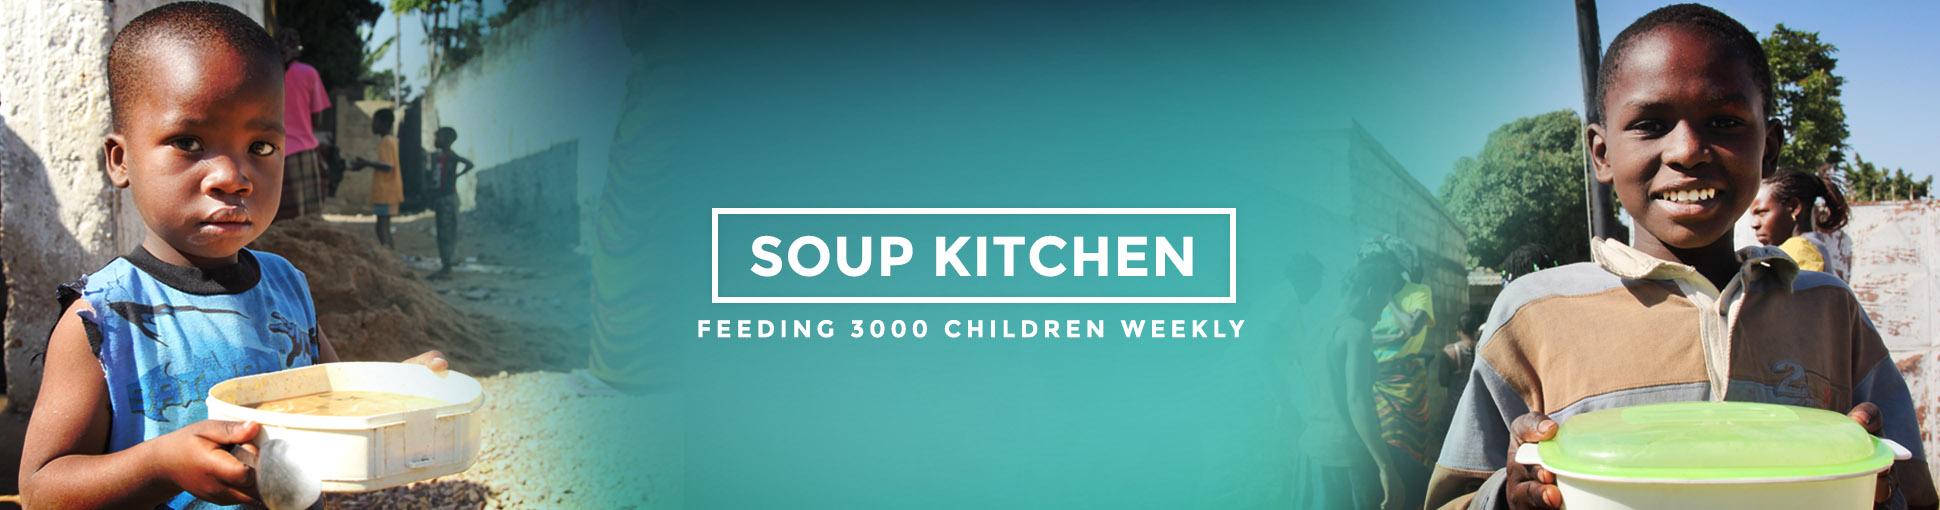 Soup kitchen vamp.jpg